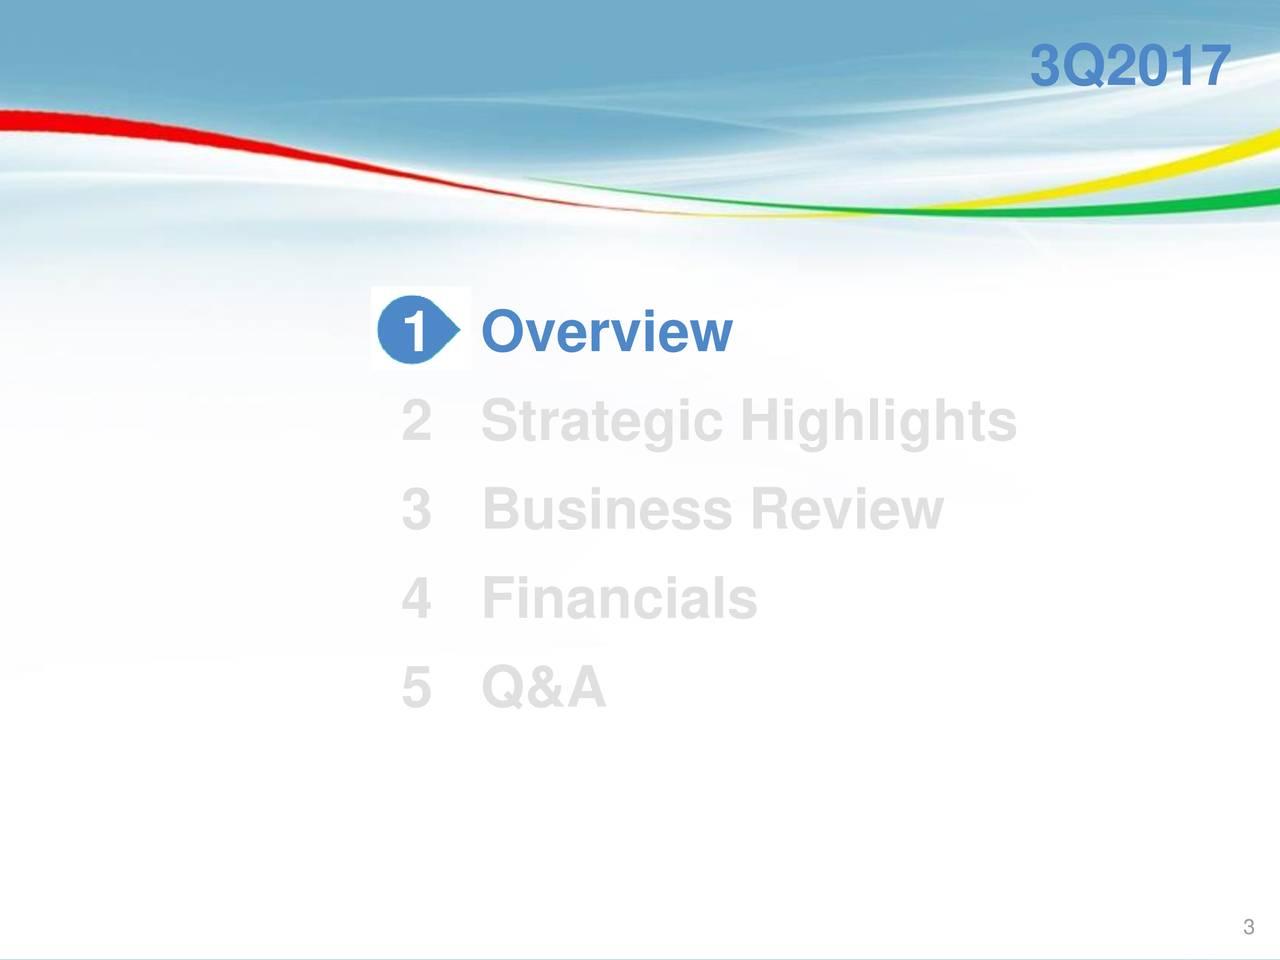 1 Overview 2 Strategic Highlights 3 Business Review 4 Financials 5 Q&A